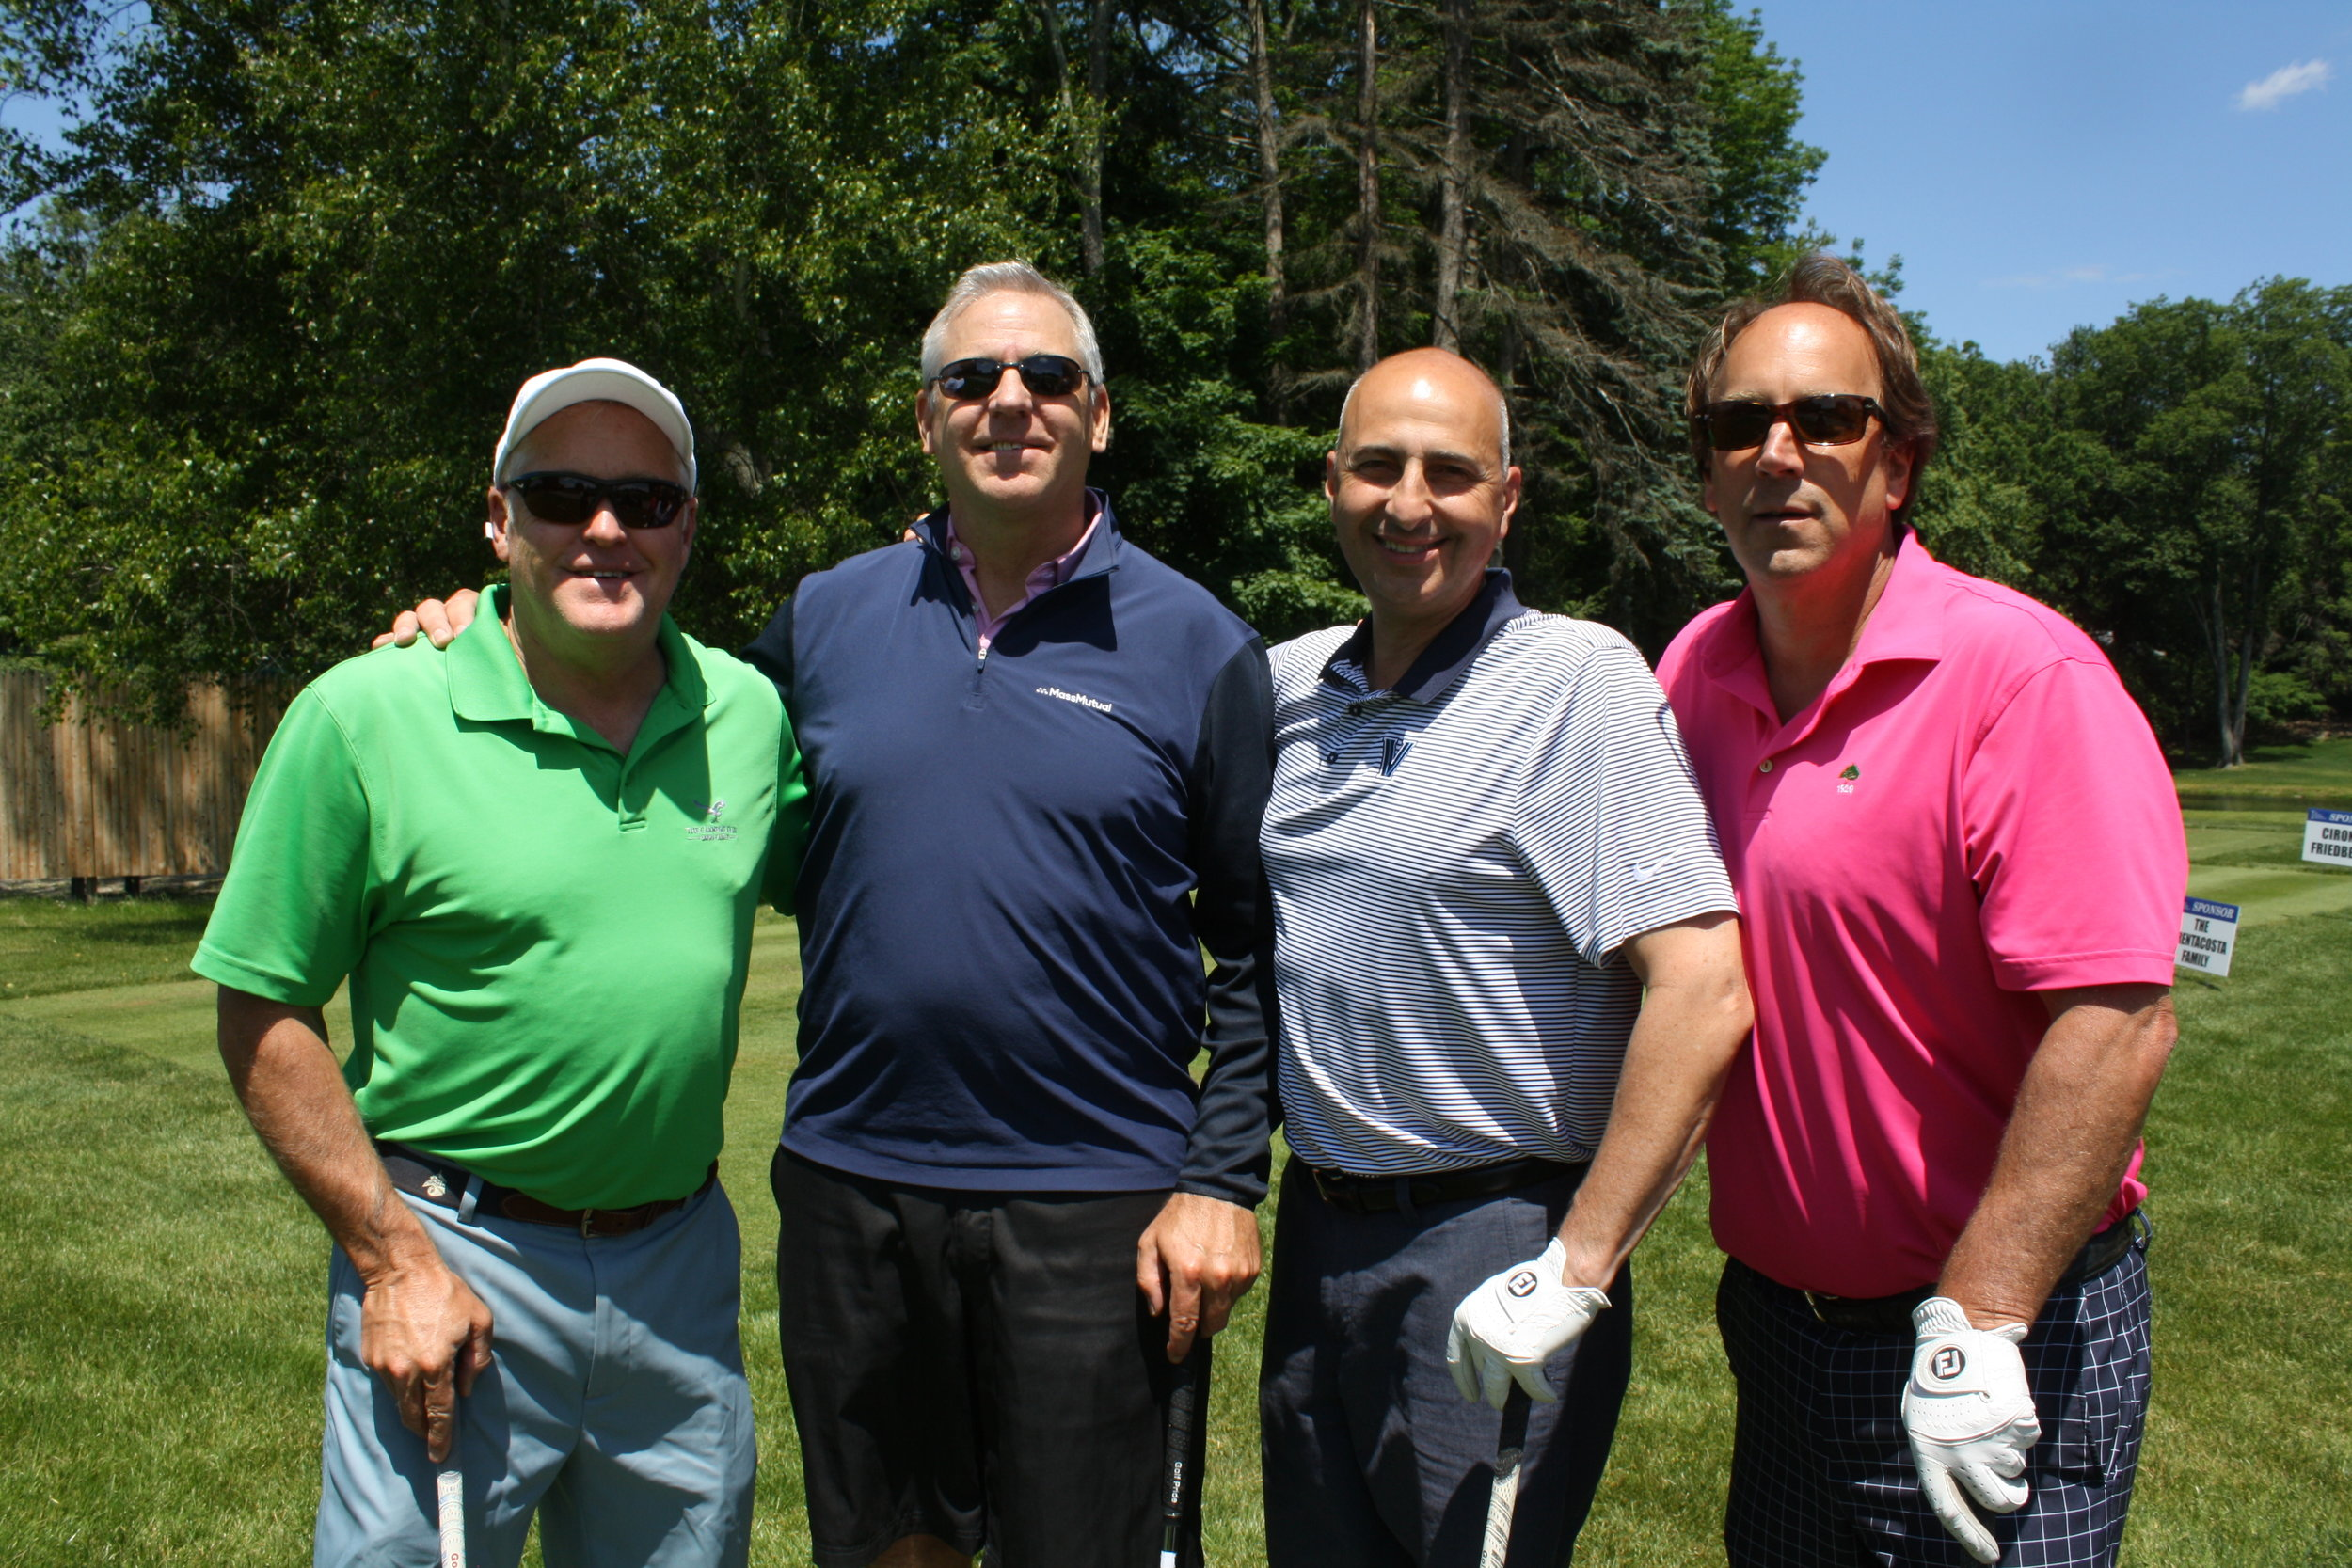 4 RRCC David Fletcher, Tim O'Connell, George Trudell, Bob Gleason.JPG